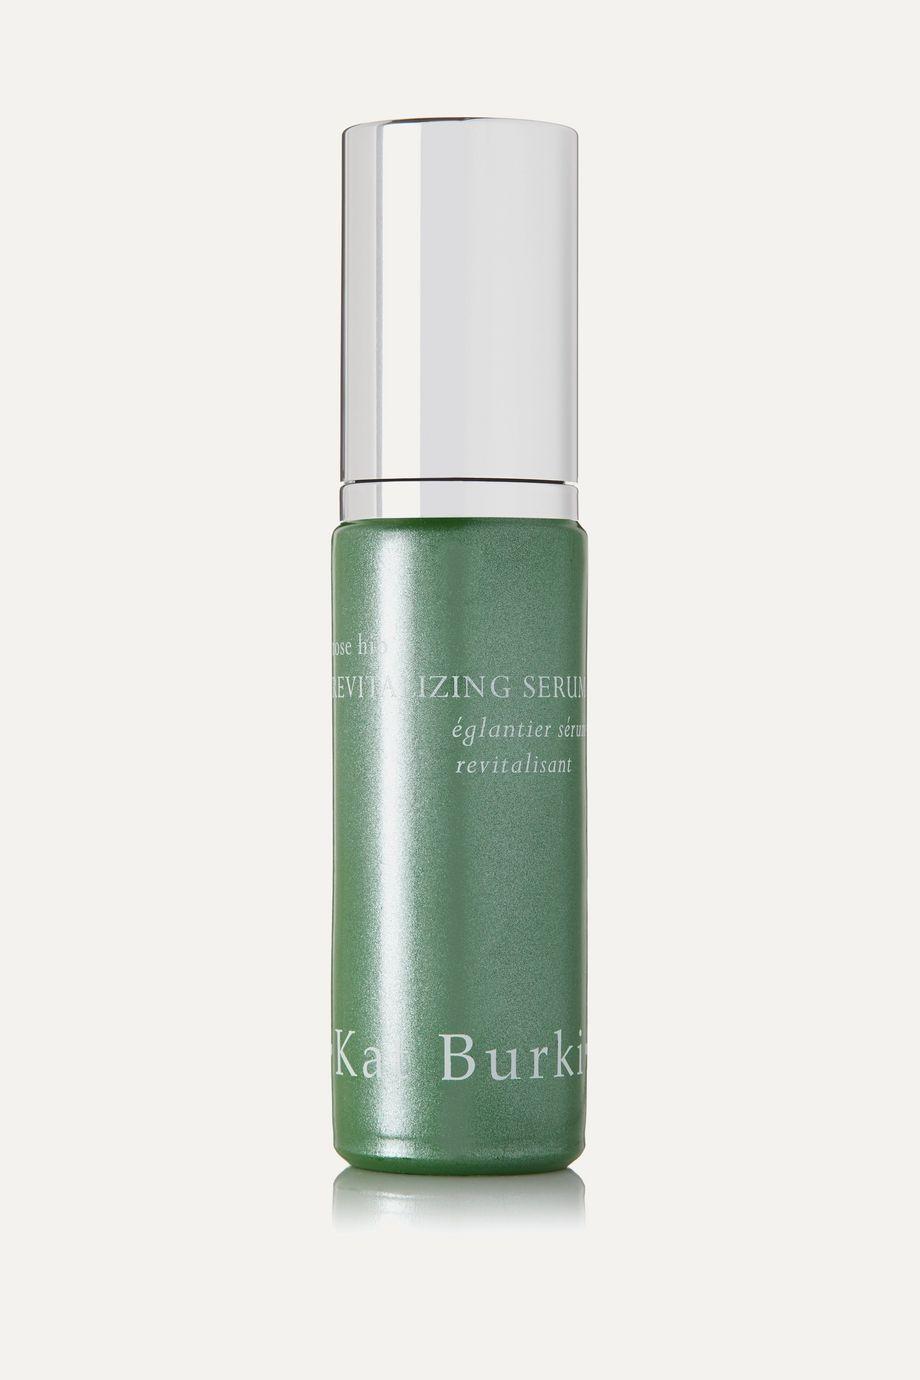 Kat Burki Rose Hip Revitalizing Serum, 30ml